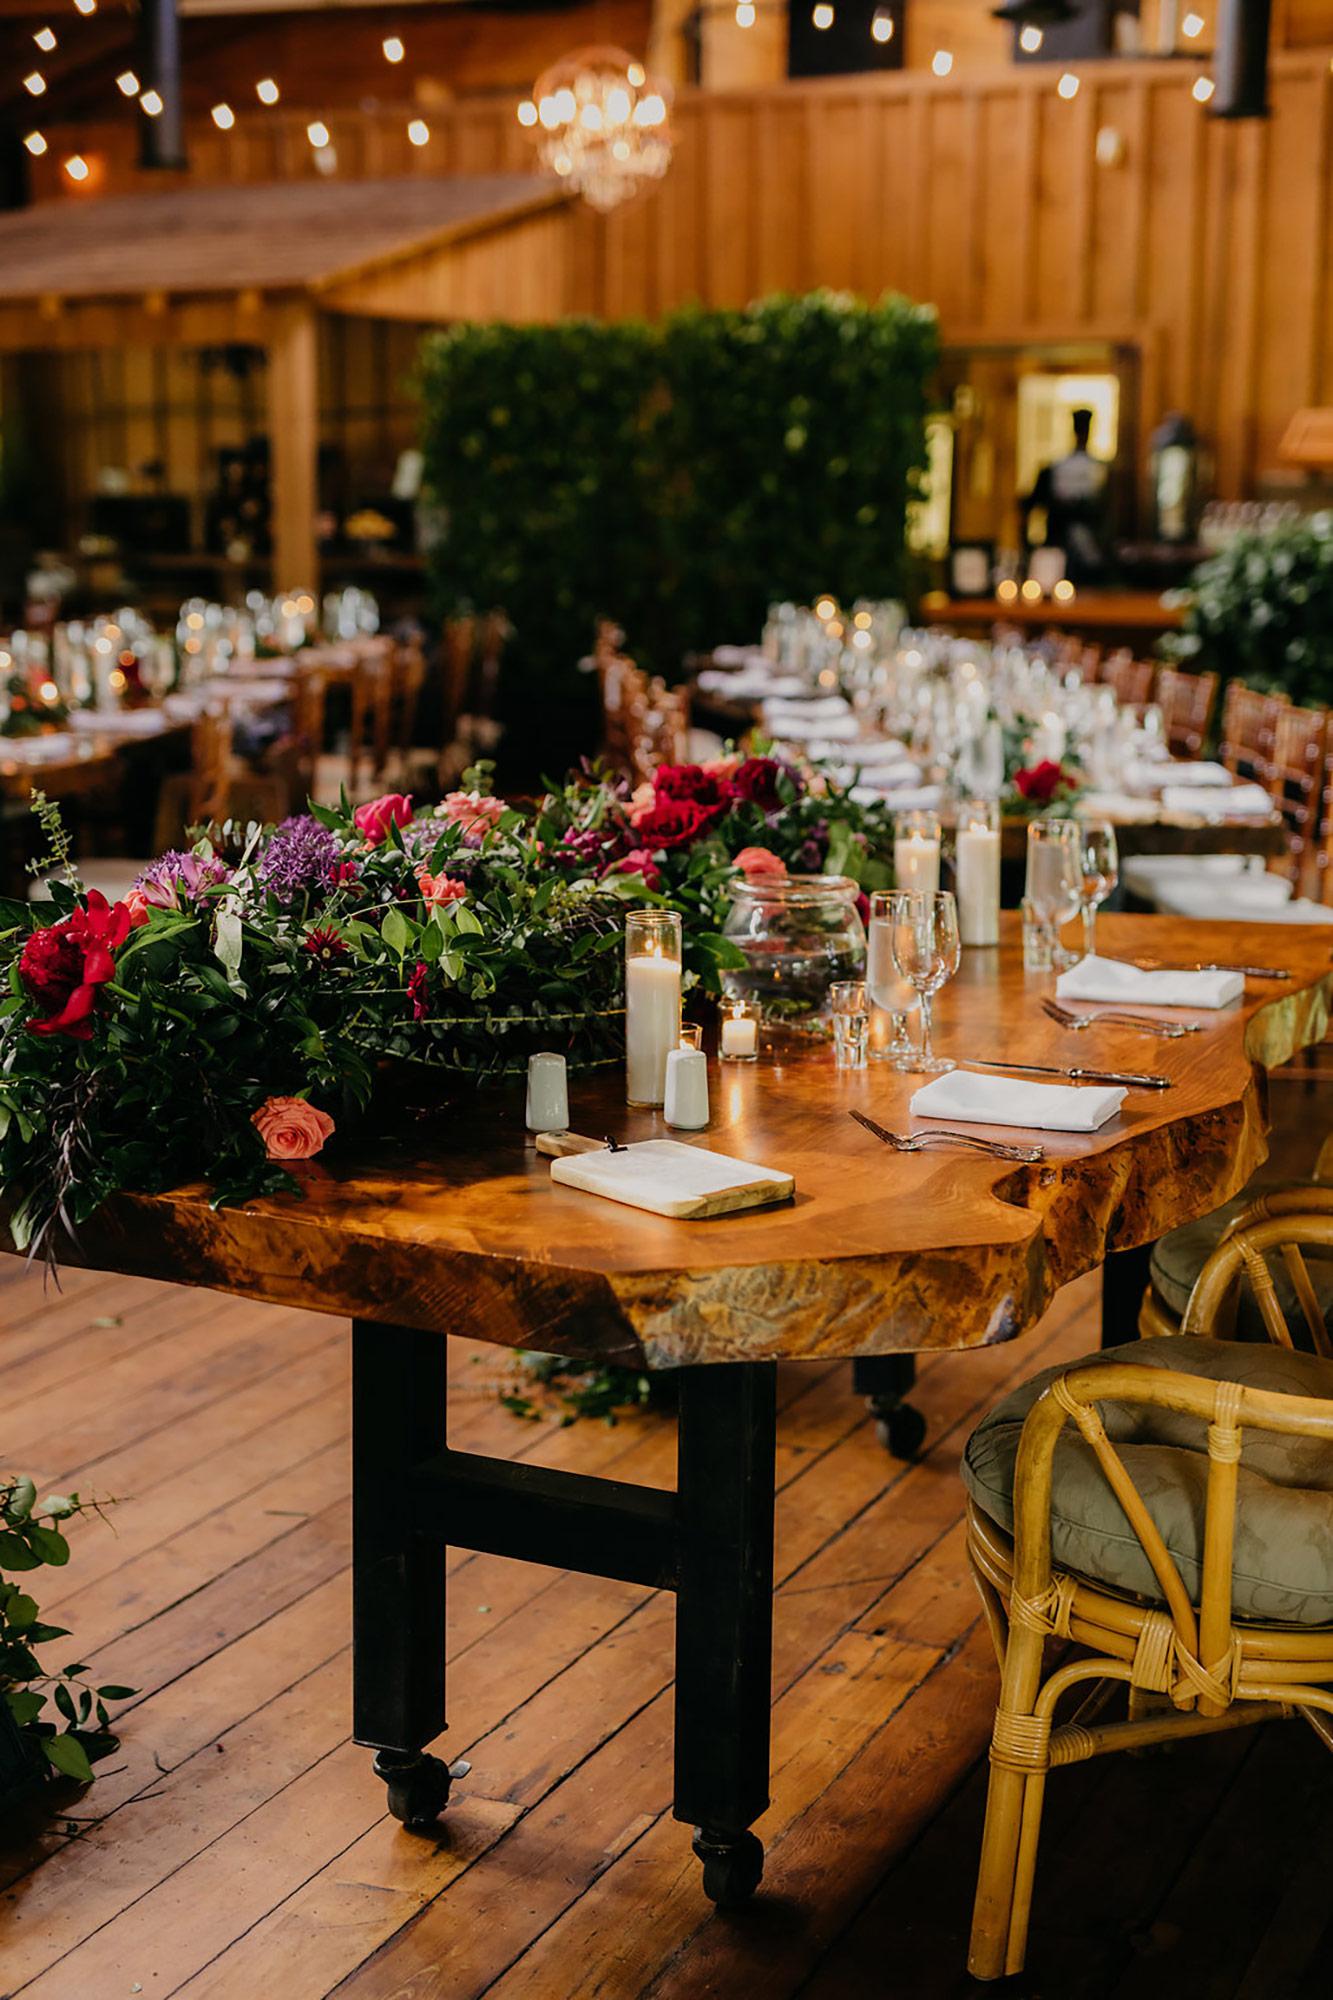 Kurtz-Orchards-Wedding-Niagara-wedding-Vineyard-Bride-Photography-by-Kayla-Rocca-044.JPG